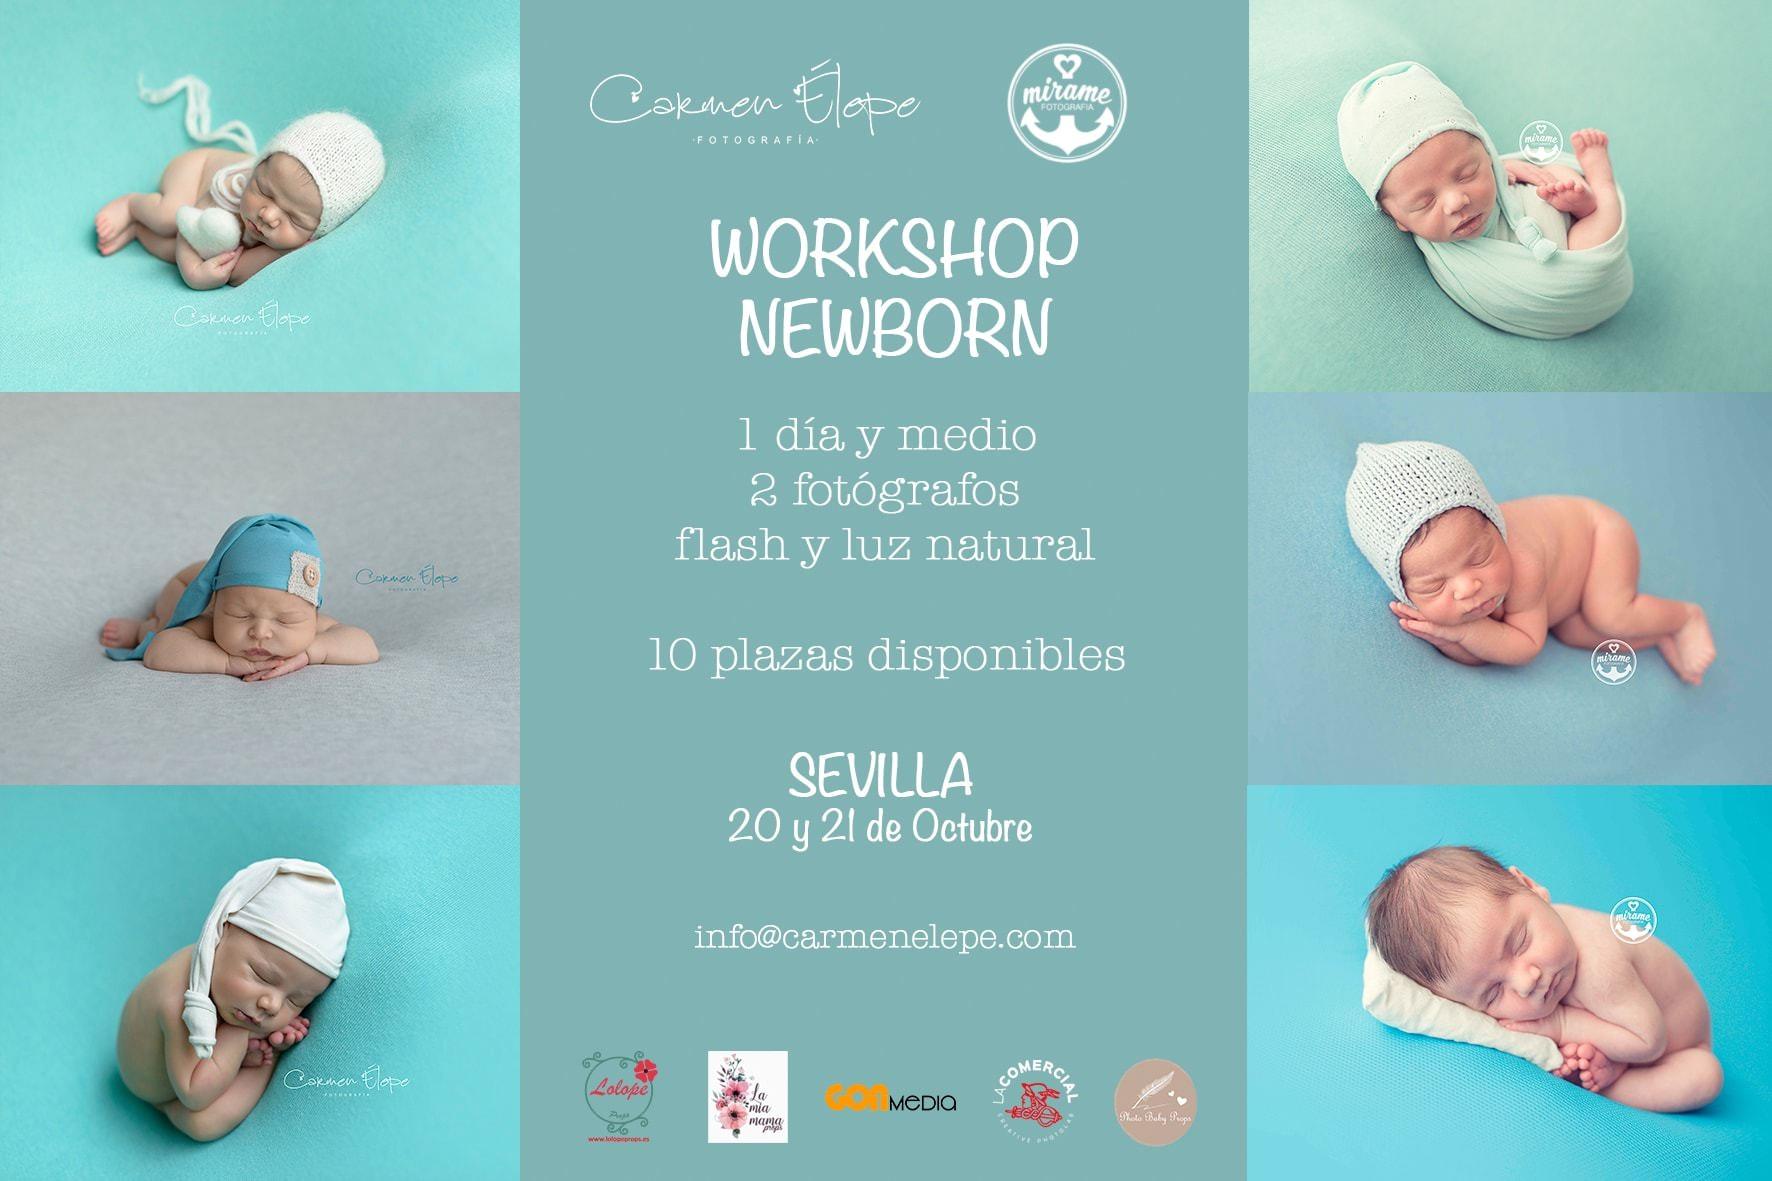 workshop fotografia newborn espana sevilla huelva granada carmen elepe mirame fotografia